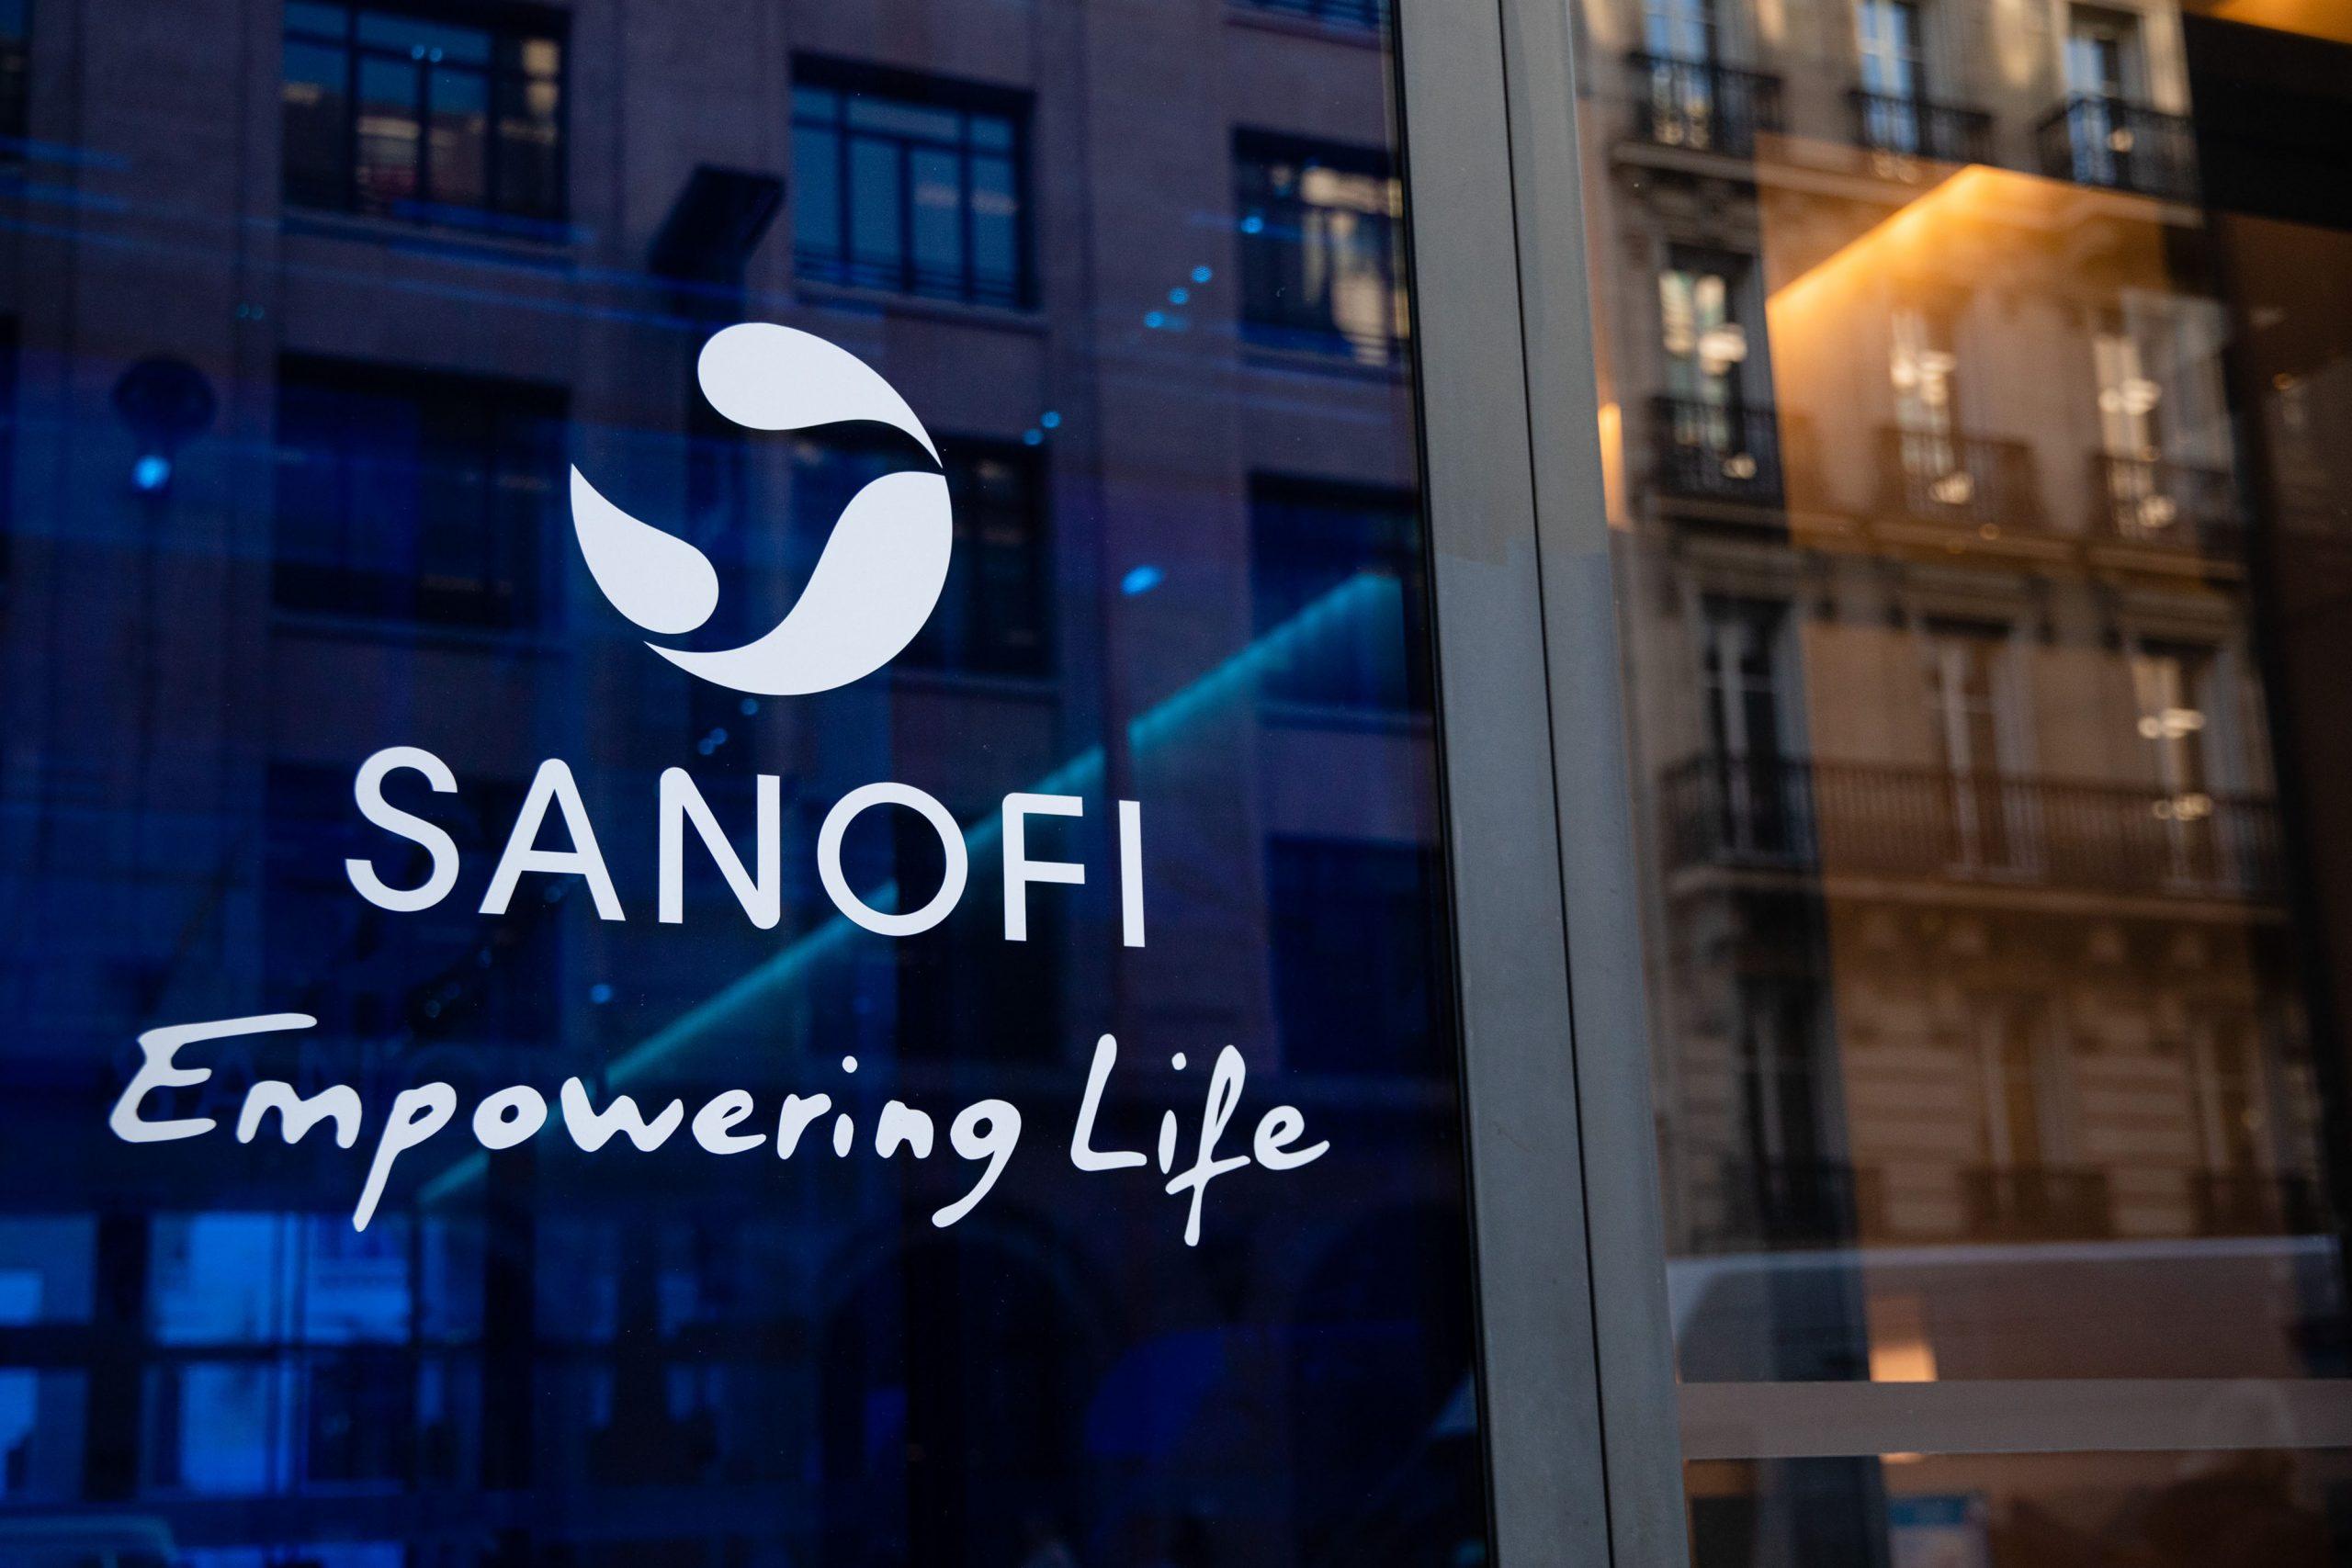 Sanofi HQ, in Paris, France, on February 6, 2020. Photographer: Marlene Awaad / Bloomberg